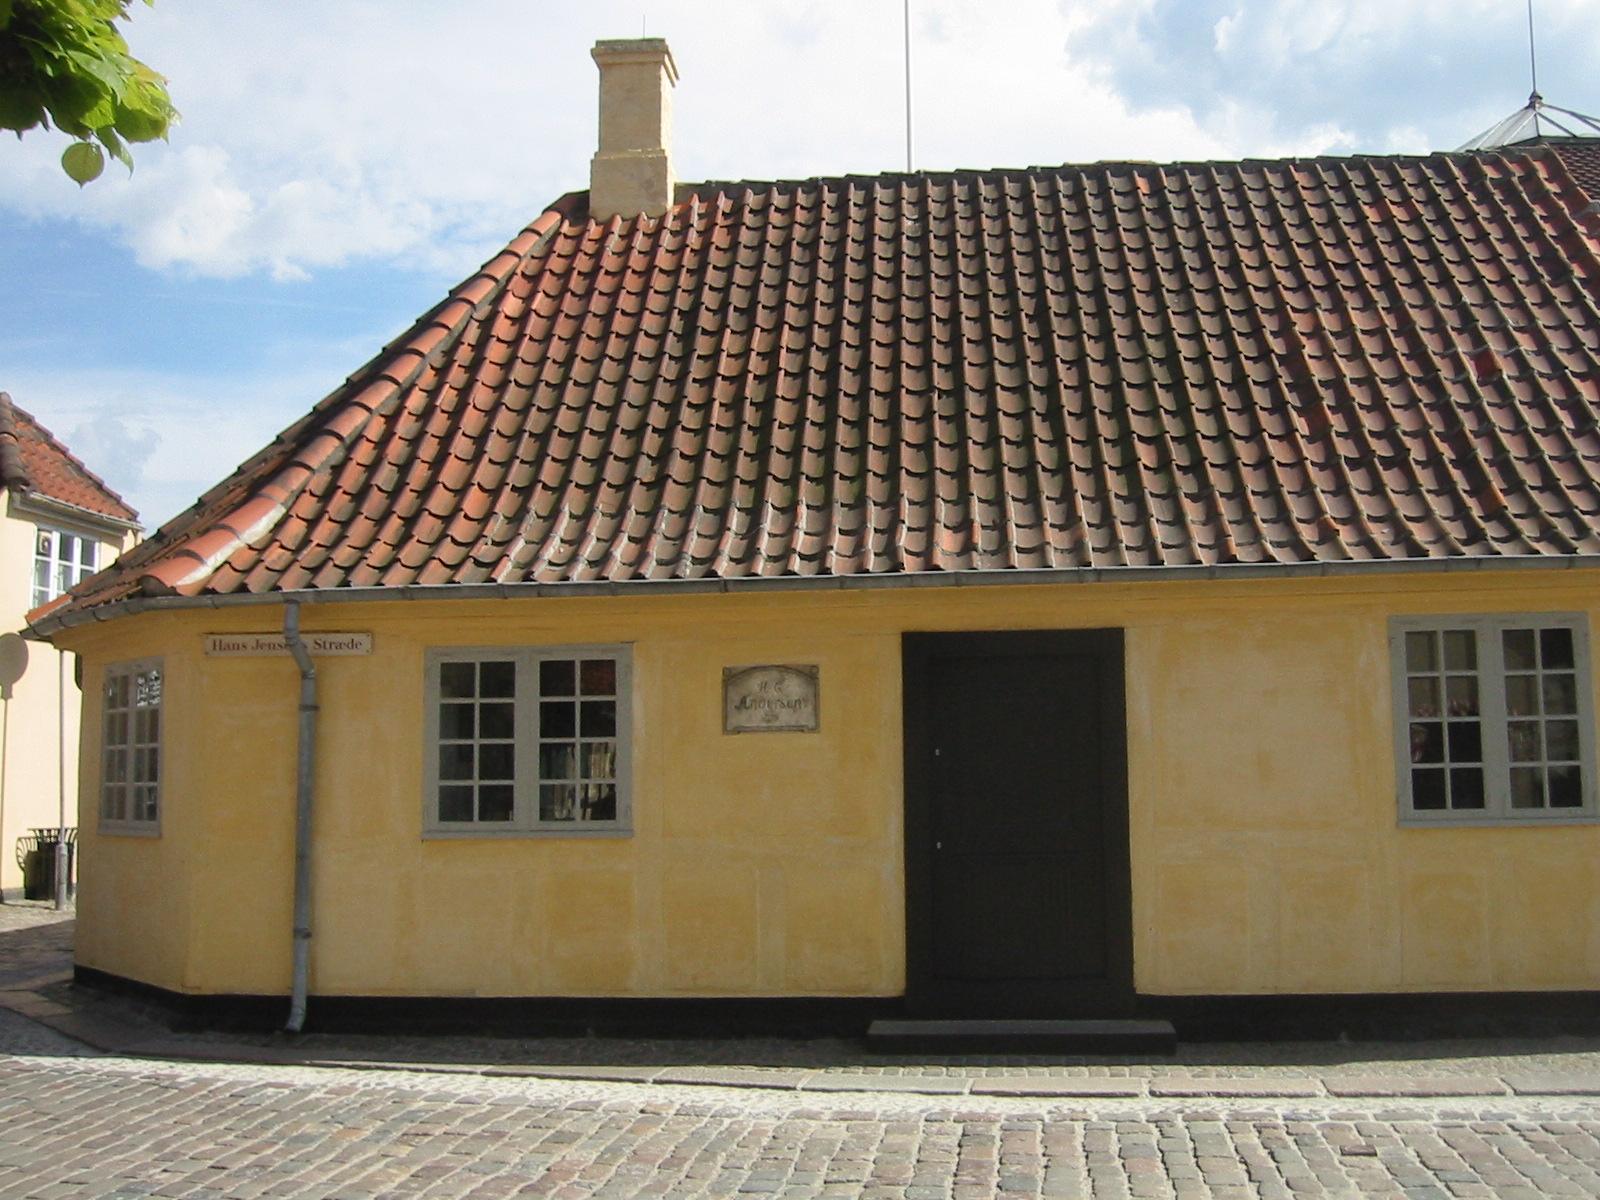 Casa de Hans Christian Andersen en Odense.